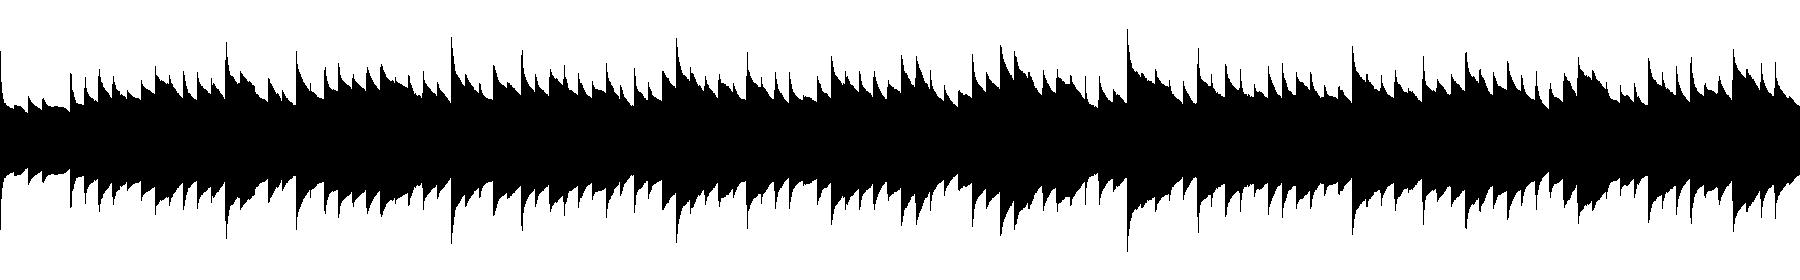 dp sequence apreg loop15